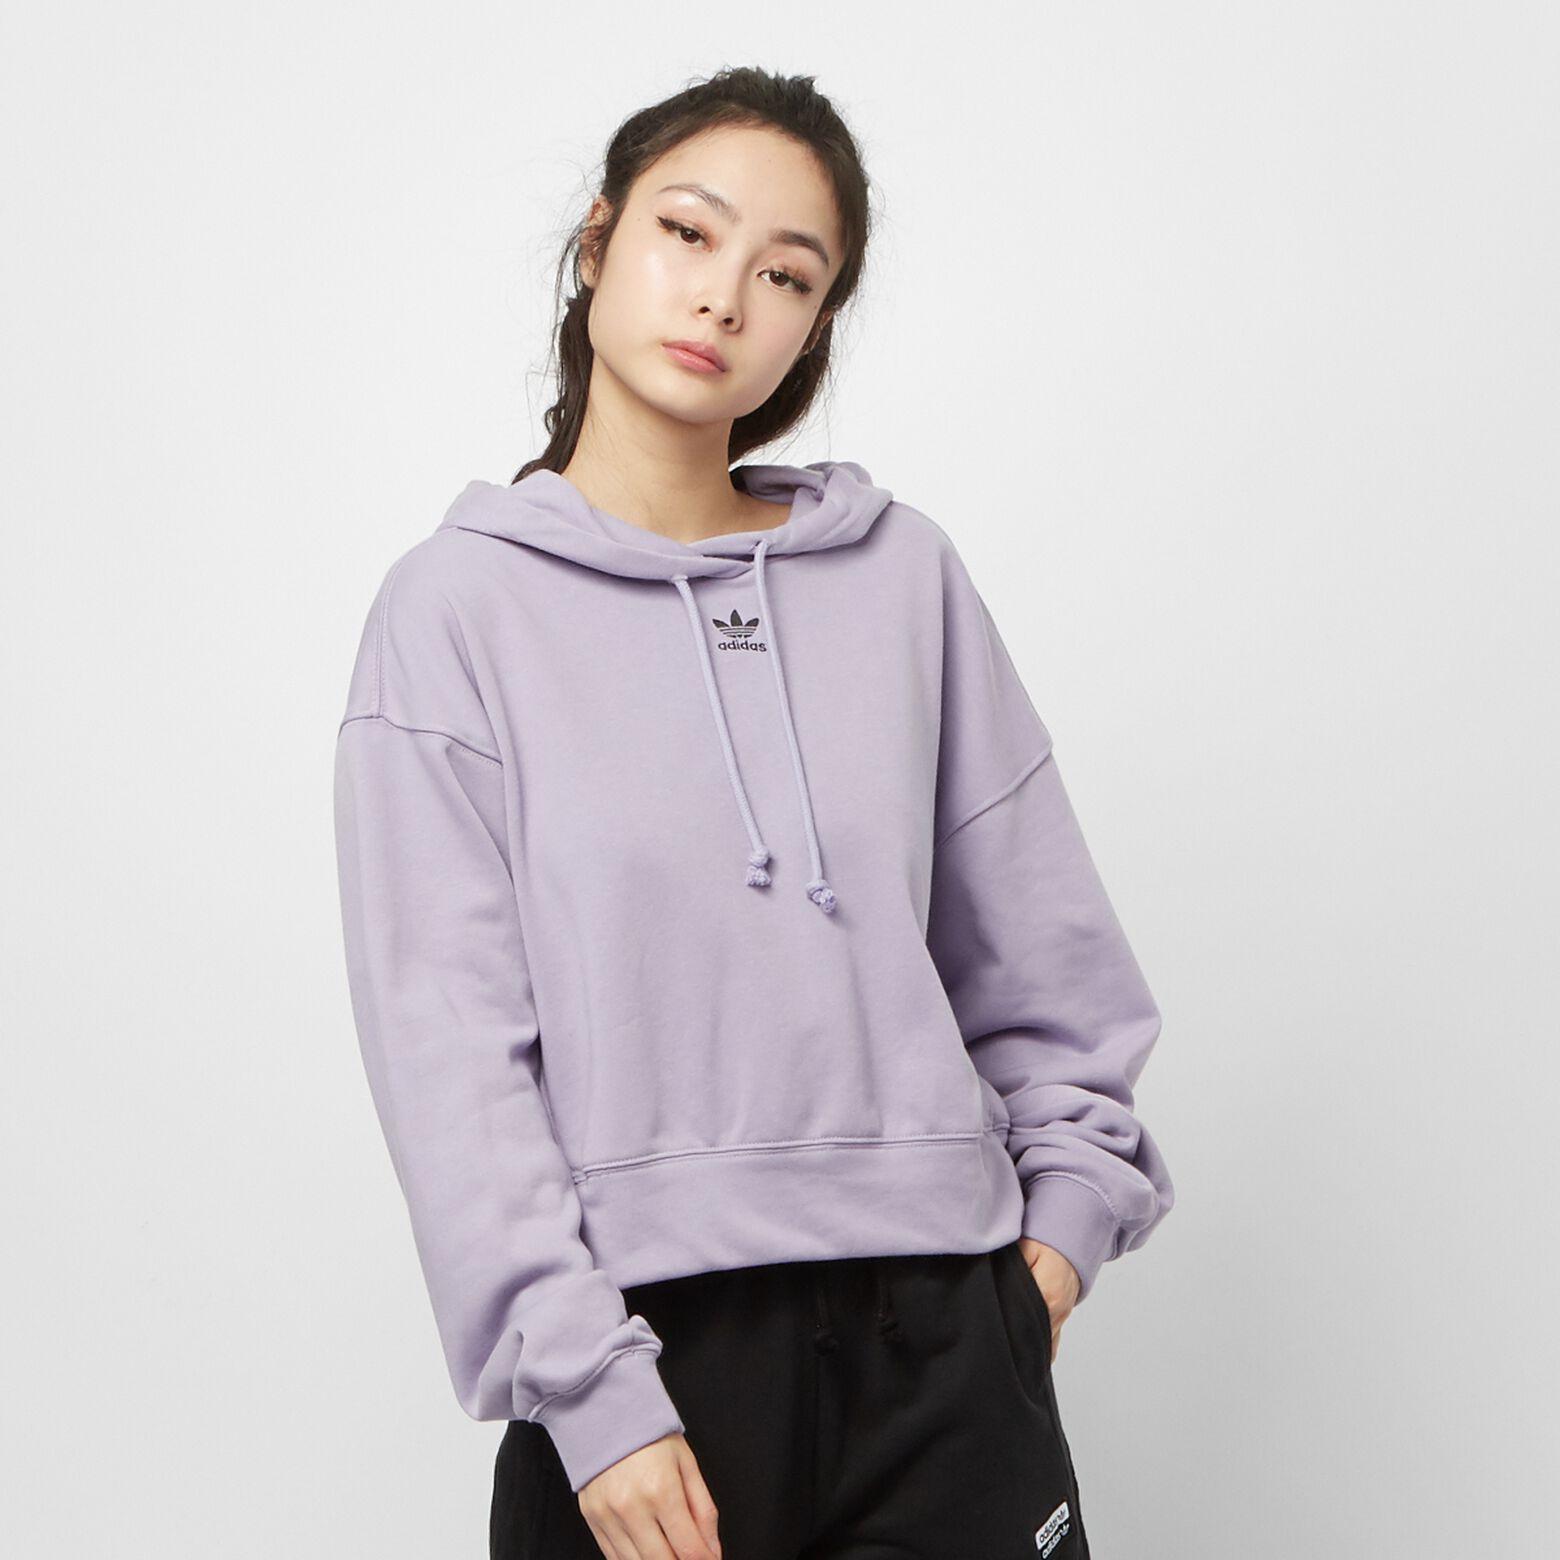 adidas Originals dames hoodie 30% extra korting